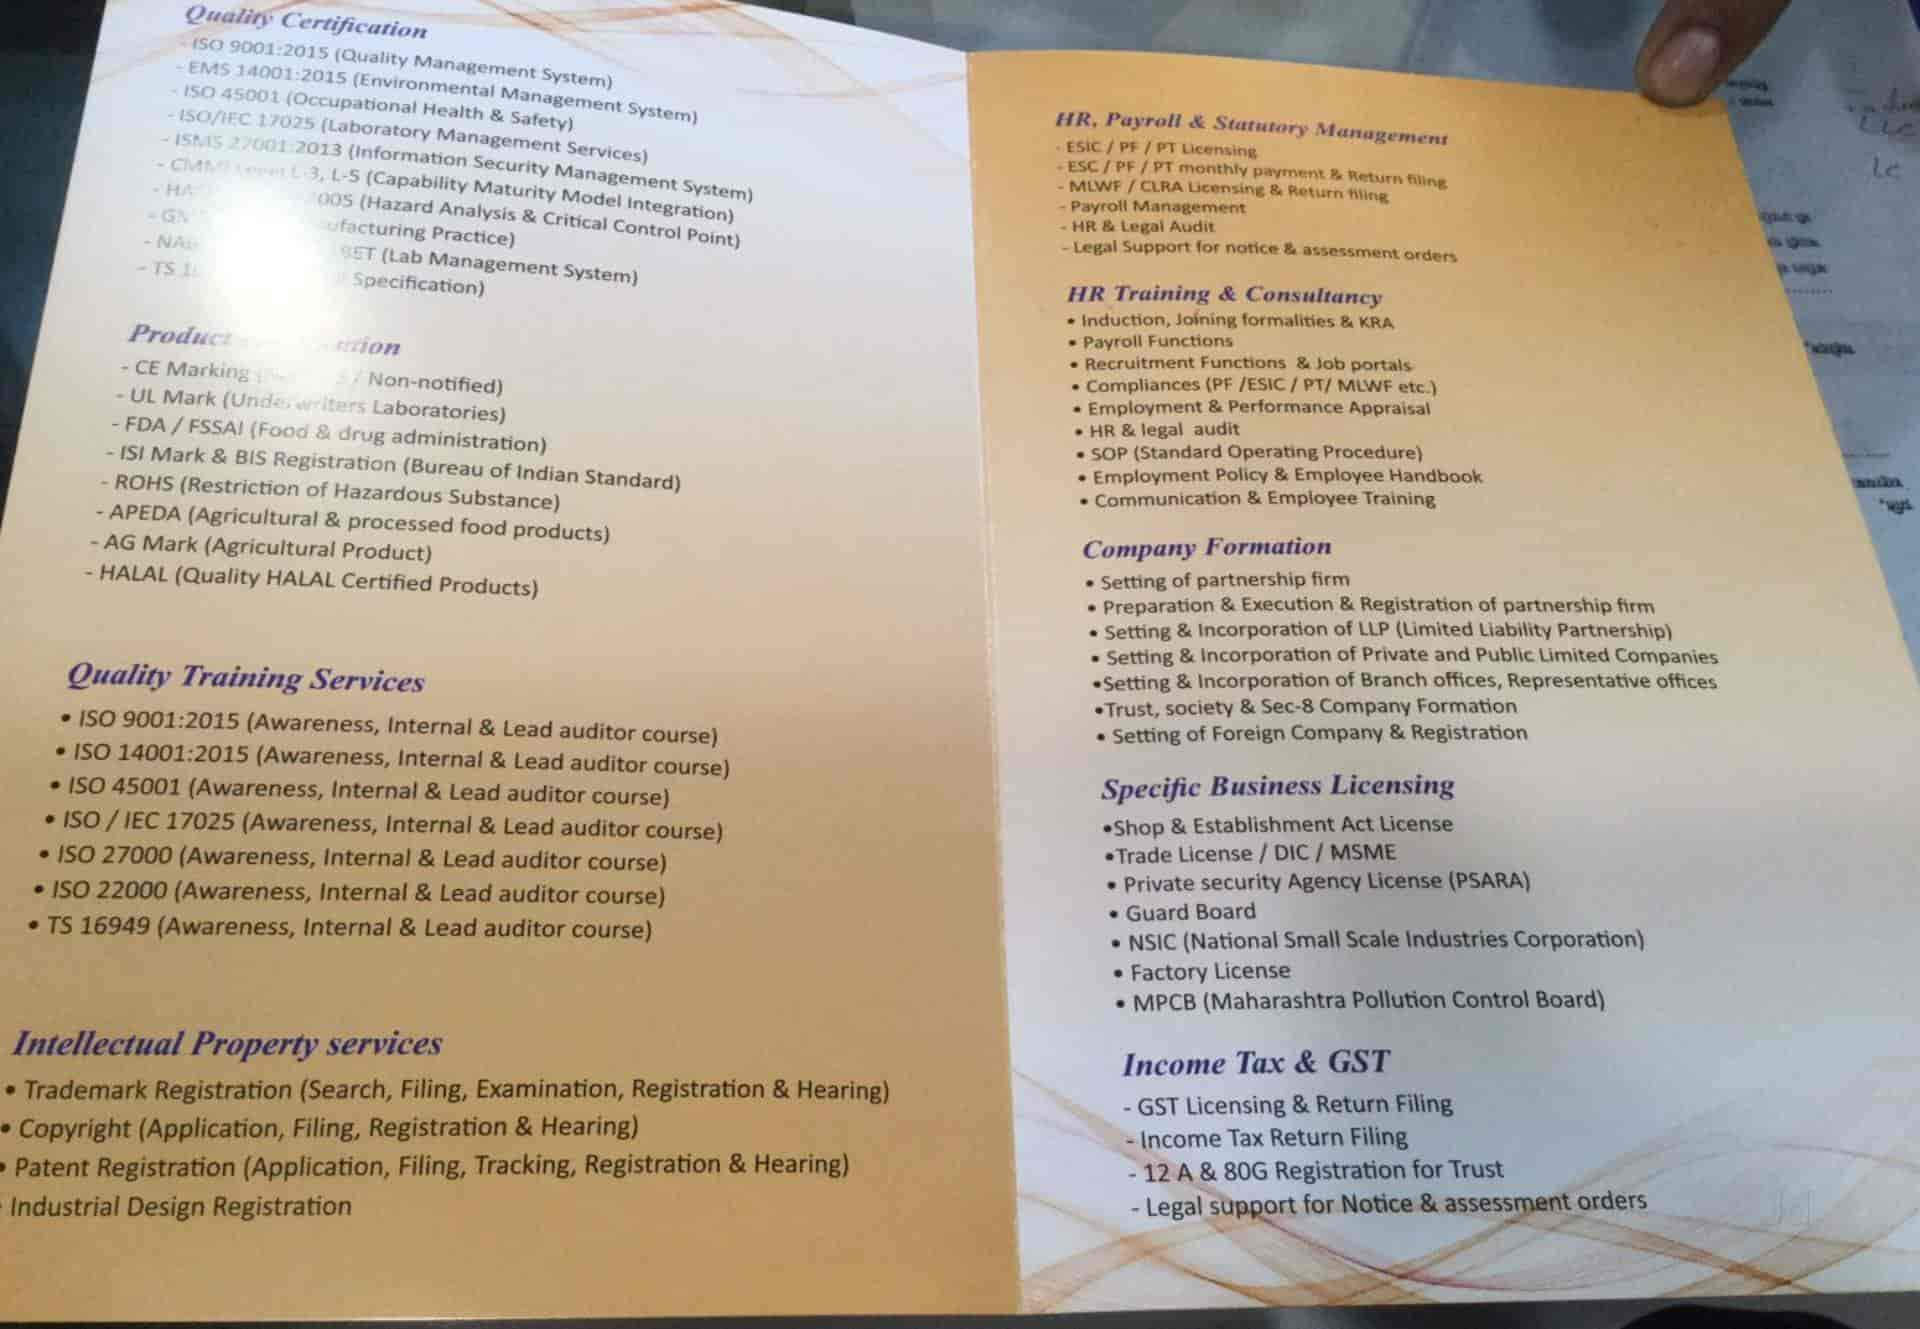 Biz Iuris Consulting India Pvt Ltd, Nashik Road - Business